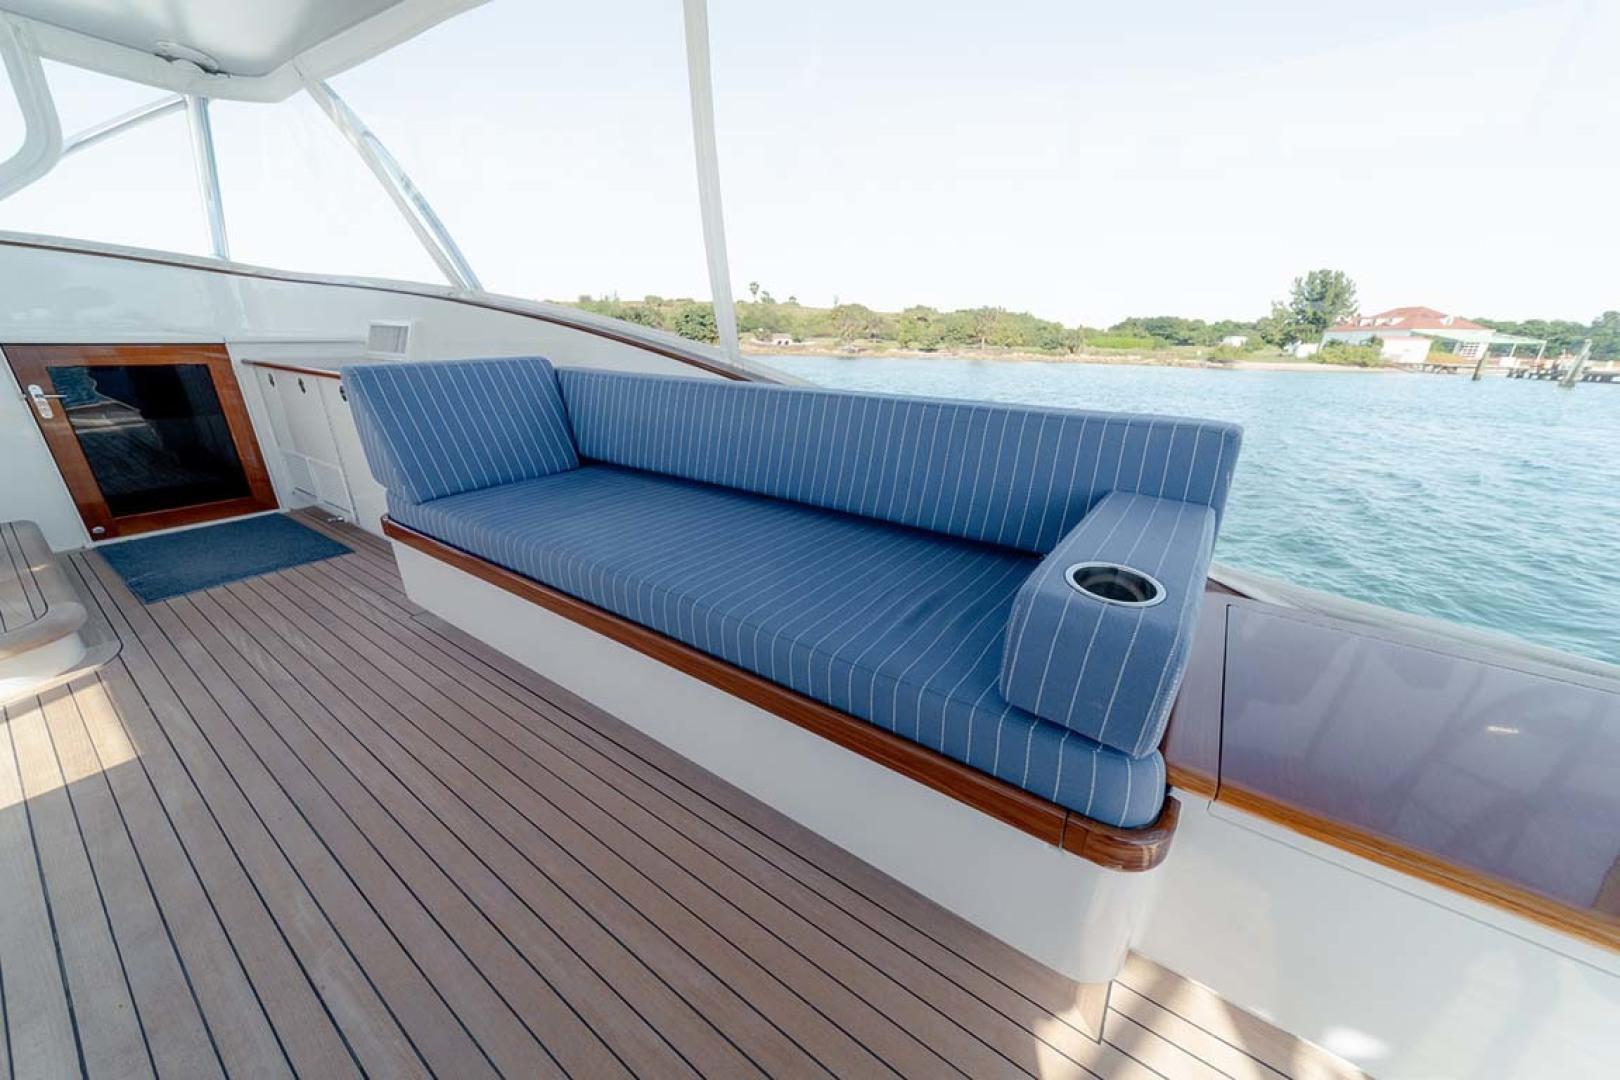 Jim Smith-Walkaround Express 2018-Eurybia North Palm Beach-Florida-United States-Starboard Bench Seating-1573735   Thumbnail